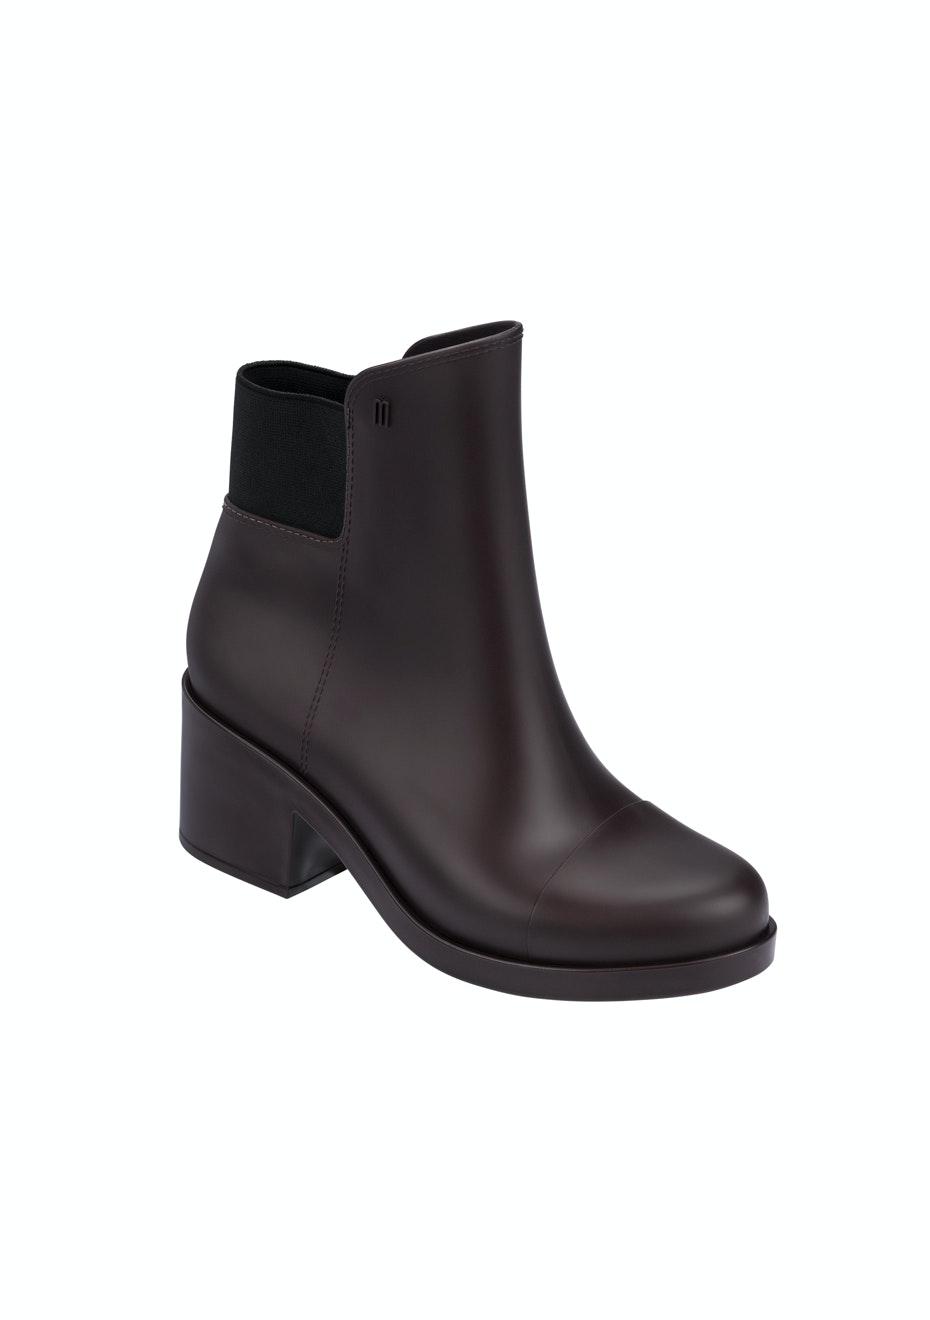 Melissa - Elastic Boot - Bordeaux